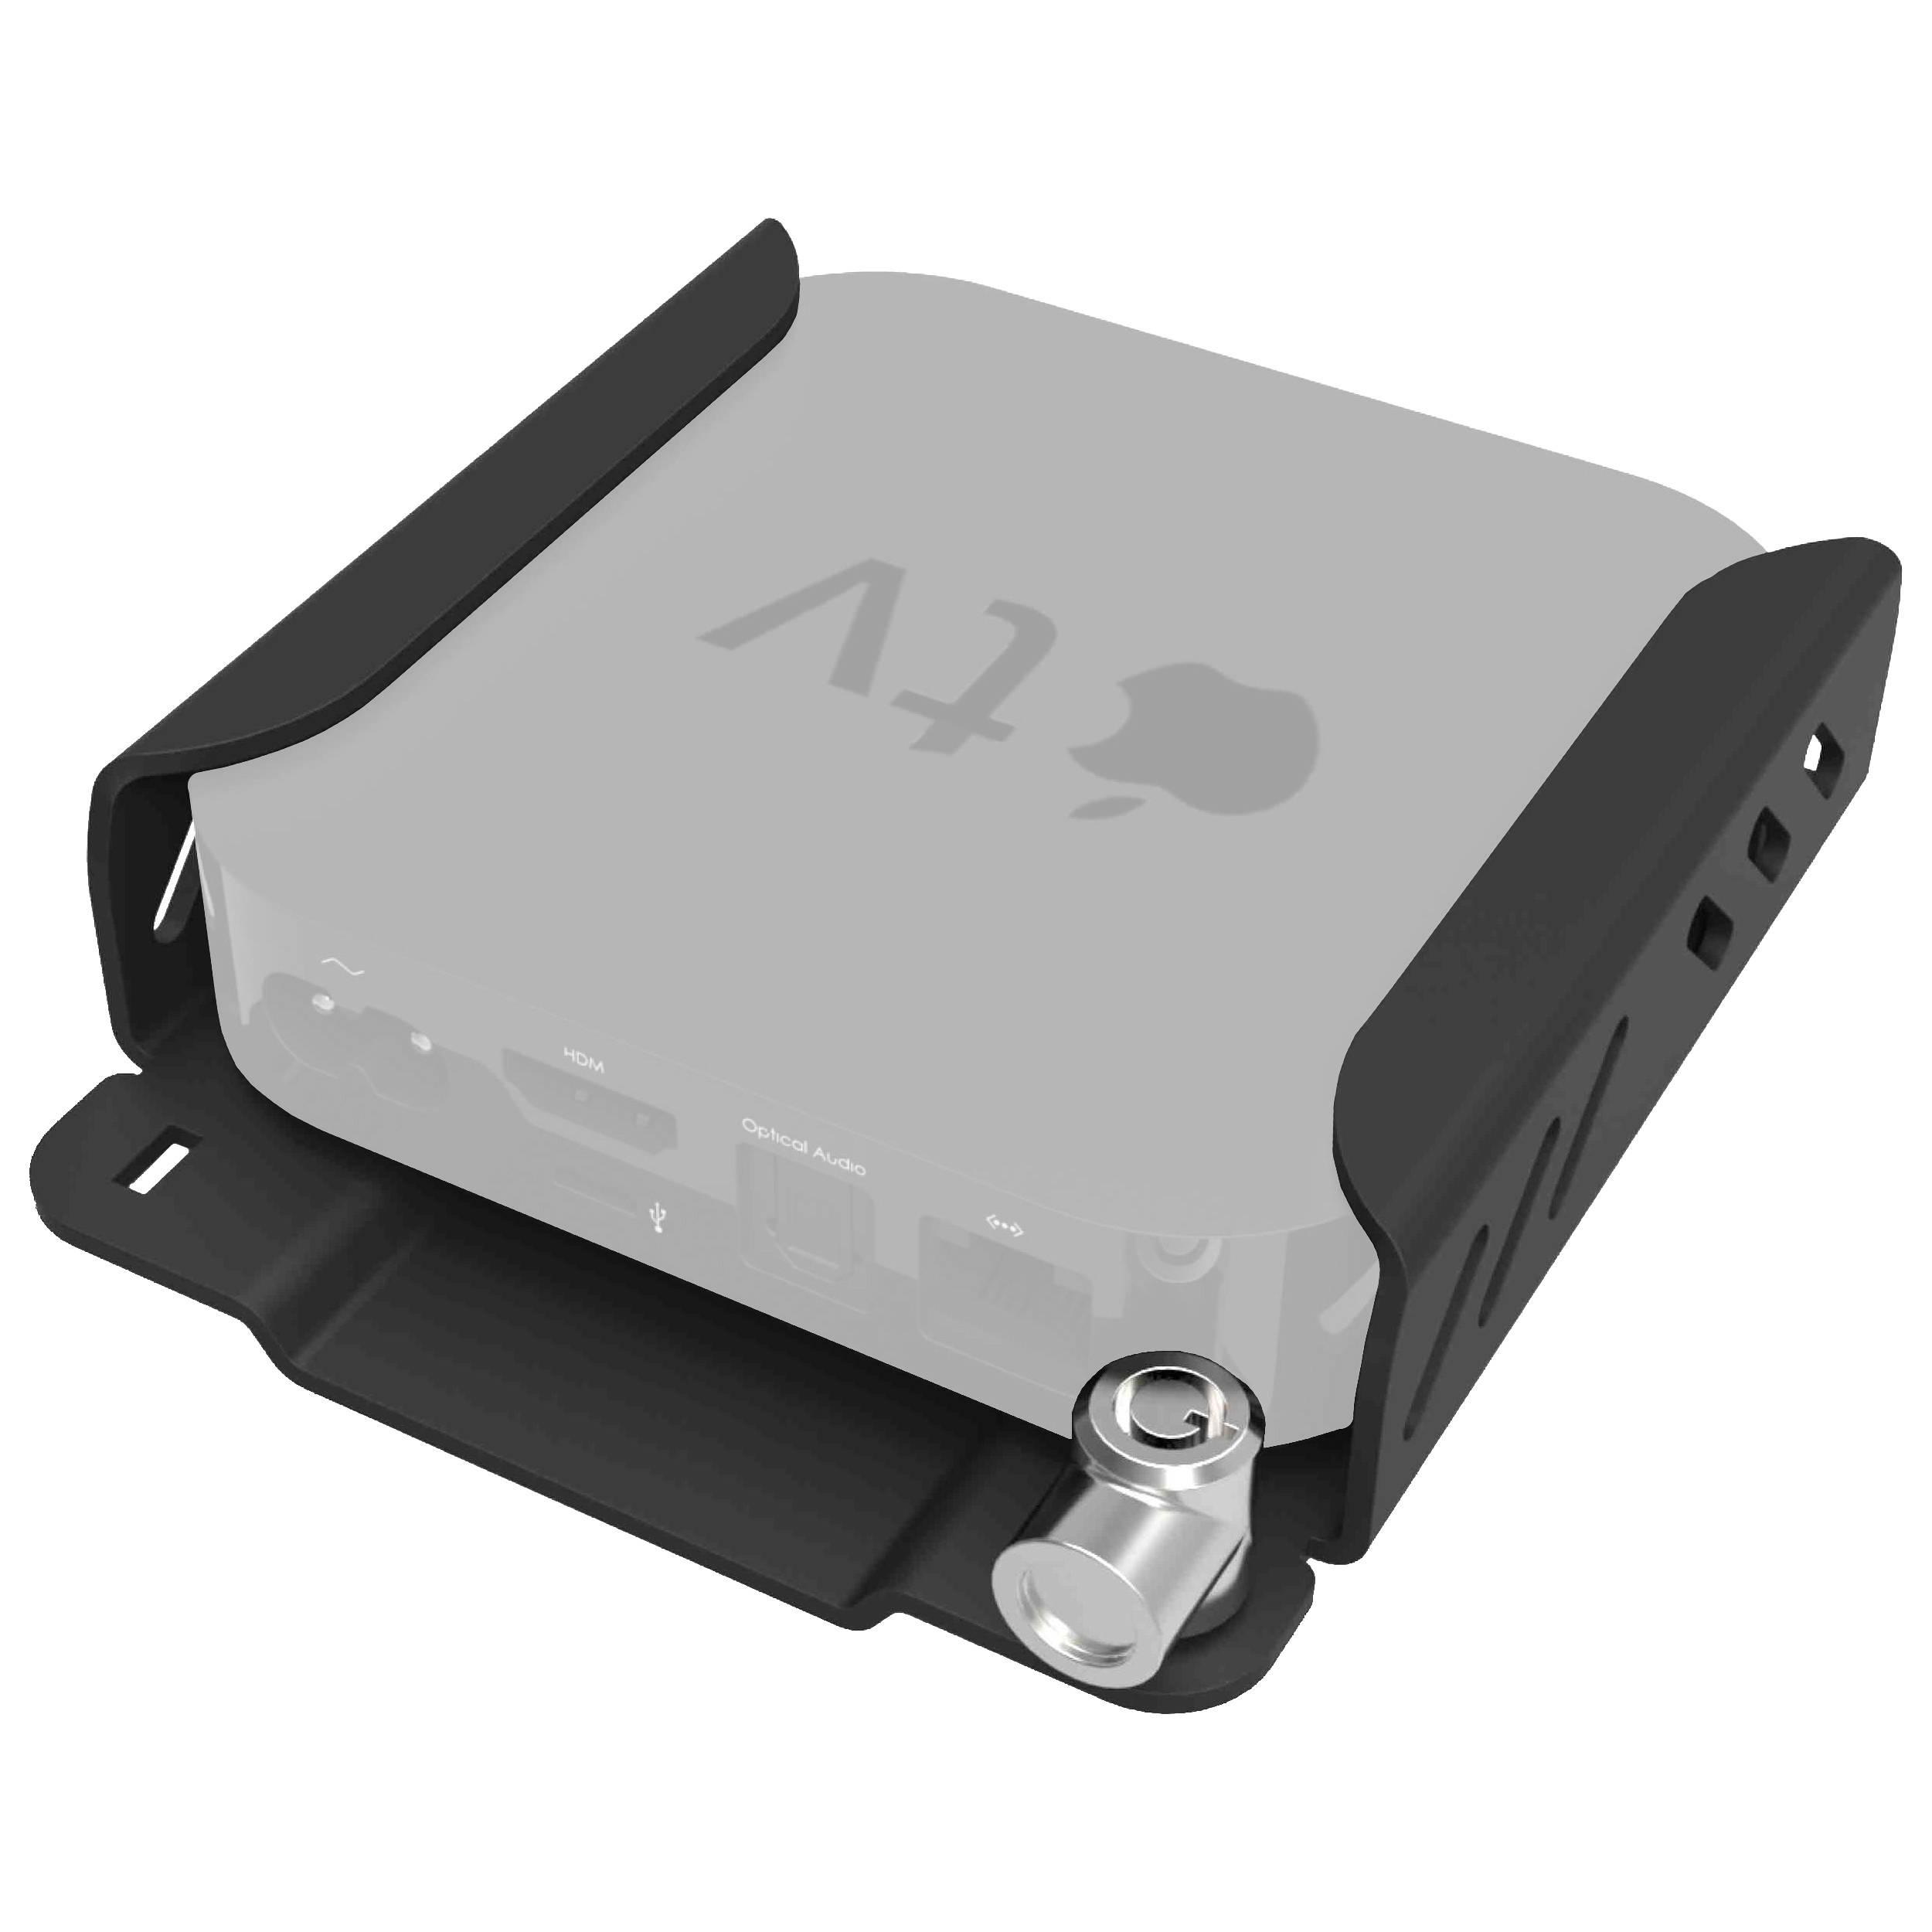 Maclocks Security Mount for the 2015 Apple TV & Apple TV 4K